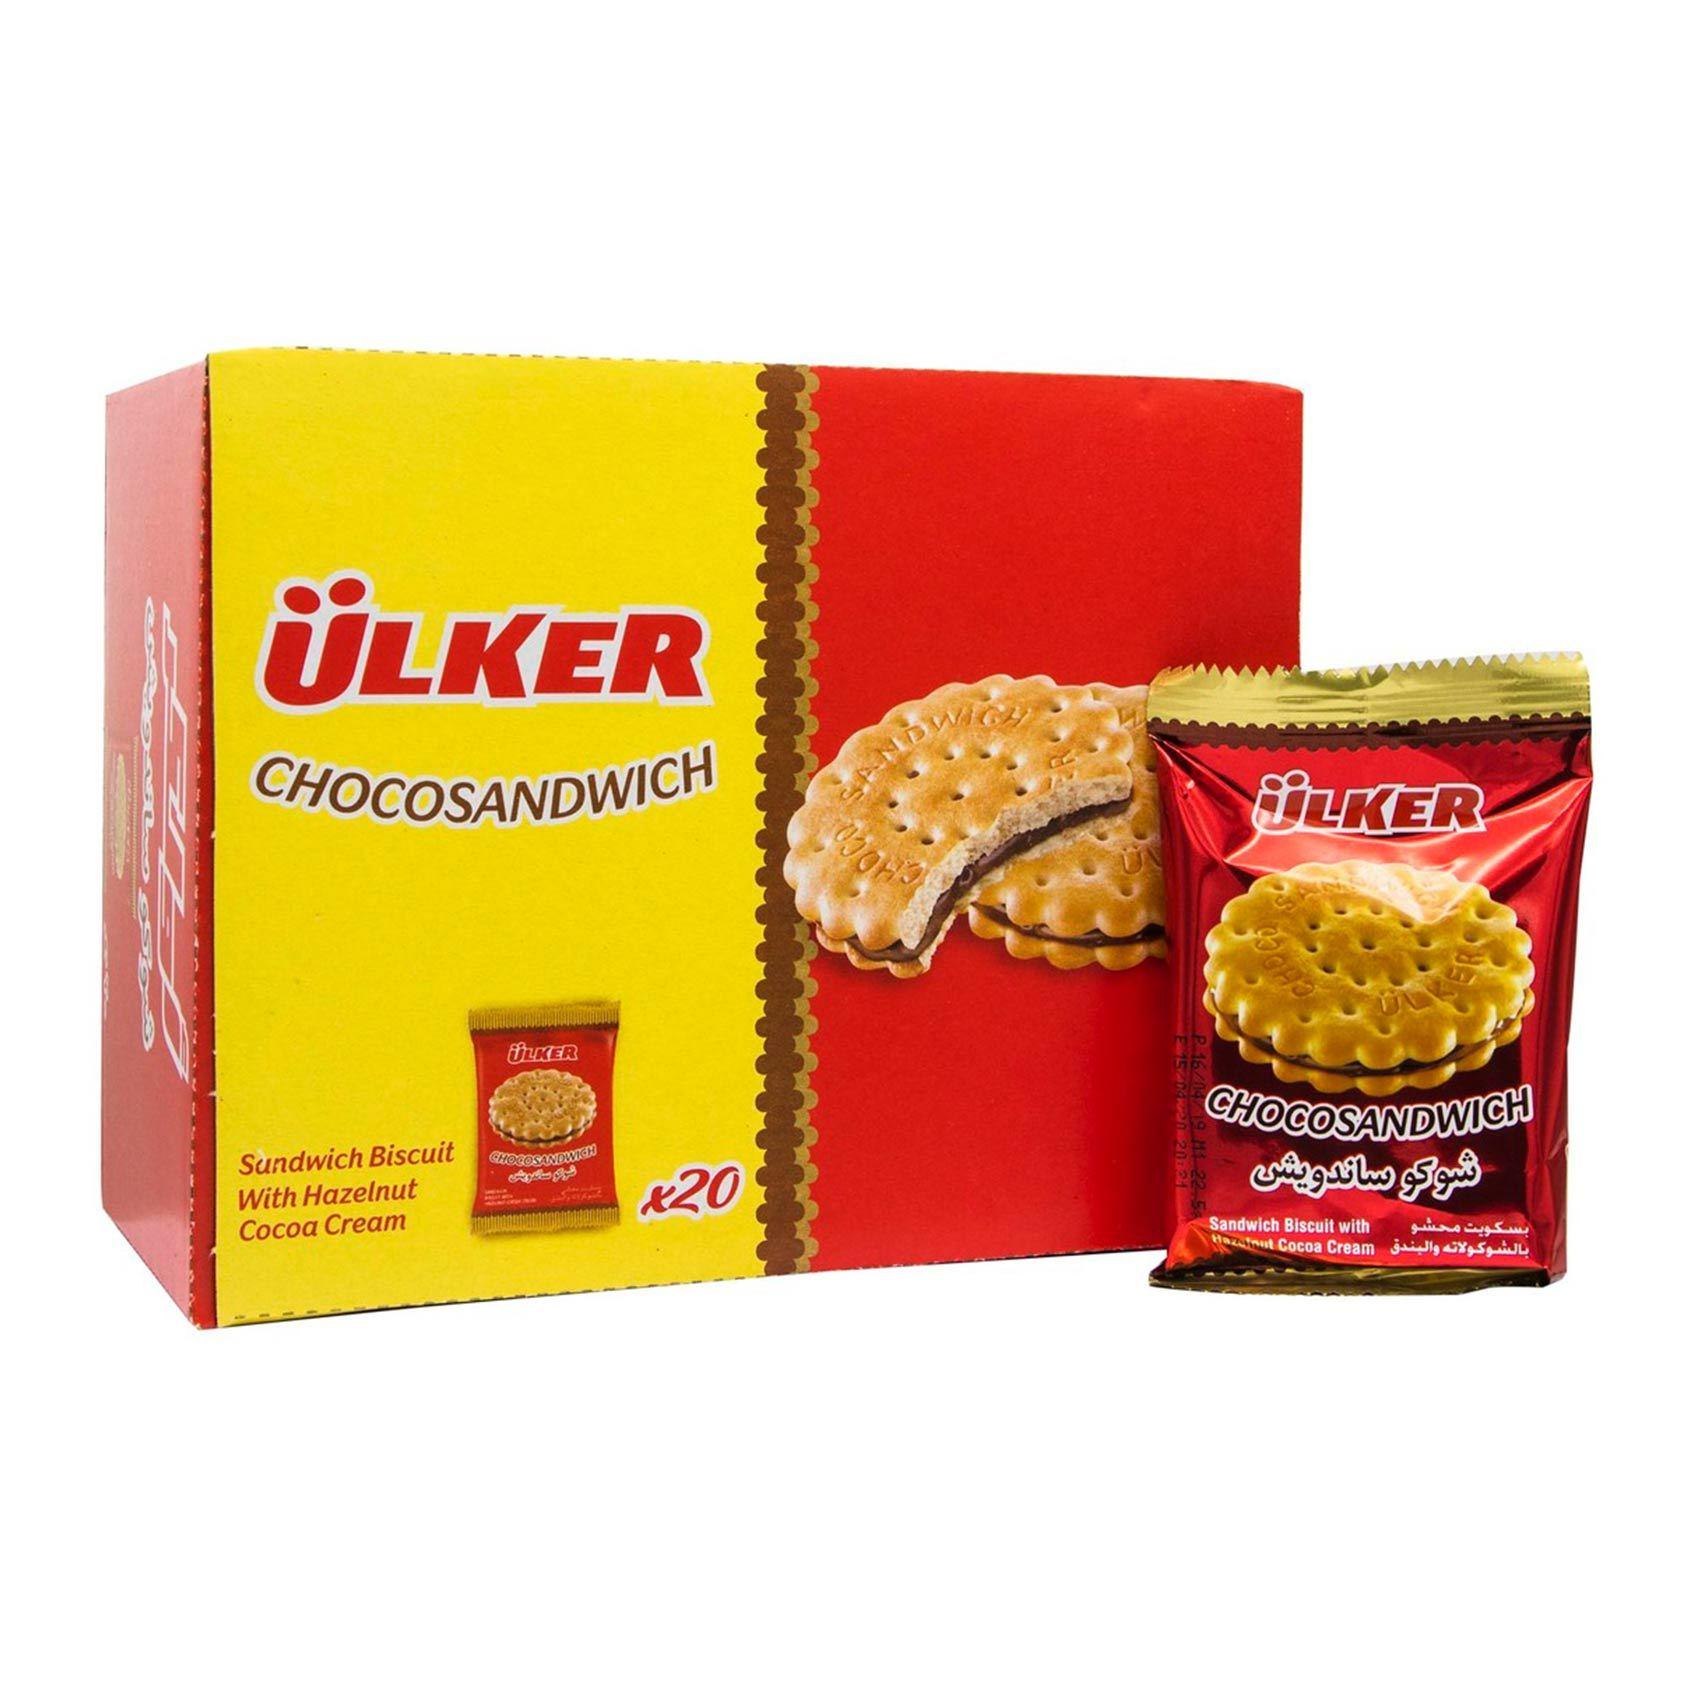 Buy Ulker Choco Sandwich Biscuit With Hazelnut Cocoa Cream 22 5 G X 20 Online Shop Food Cupboard On Carrefour Saudi Arabia